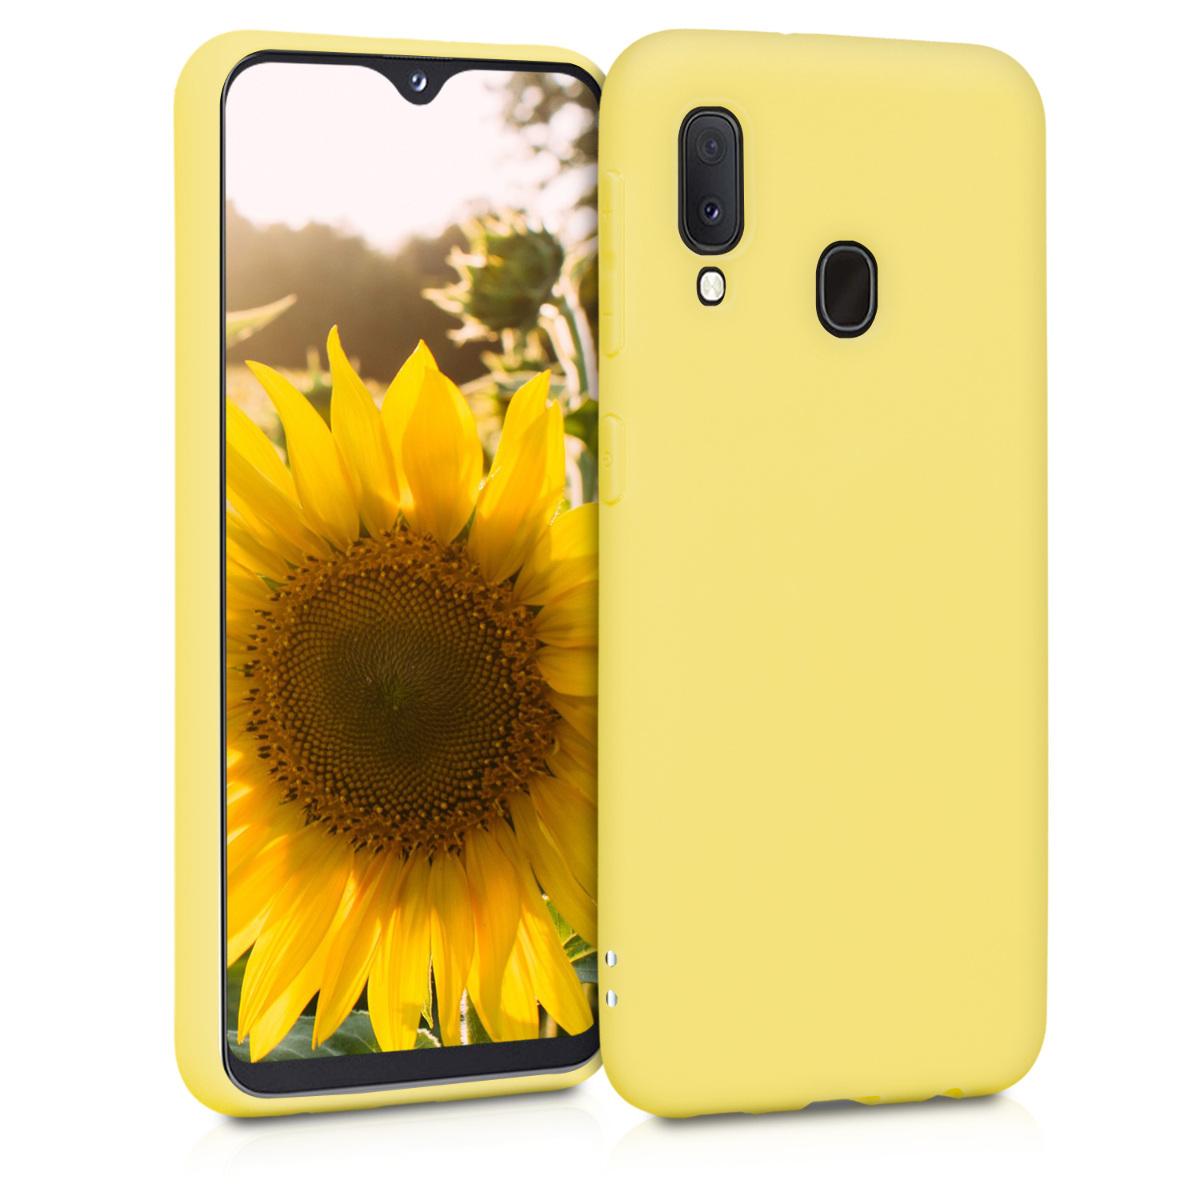 KW Θήκη Σιλικόνης Samsung Galaxy A20e - Yellow Matte (48738.49)